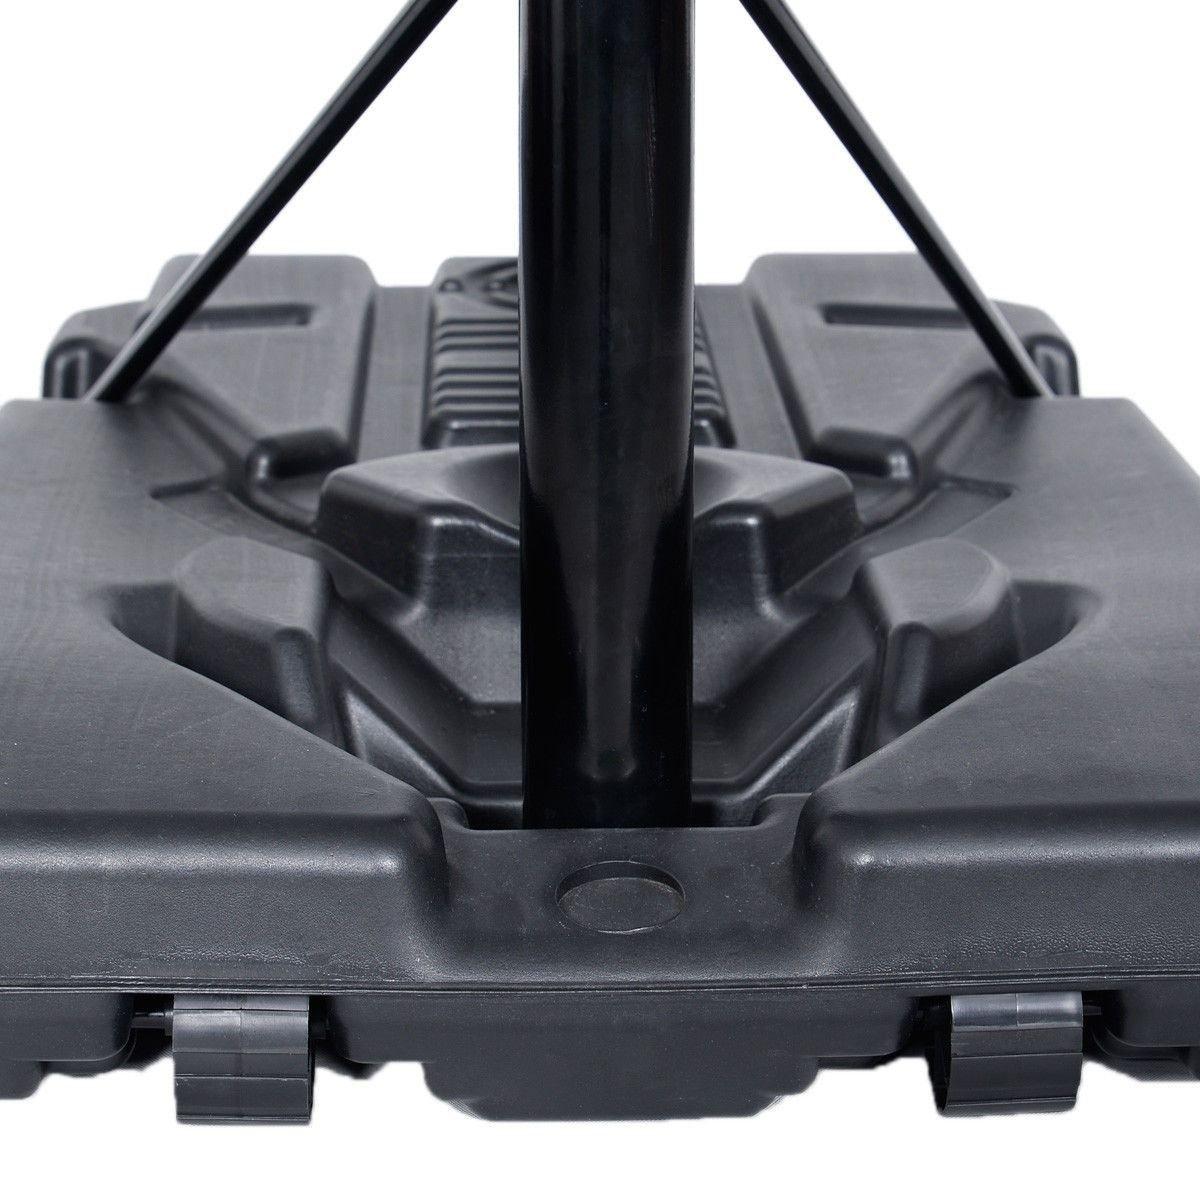 42''x28'' Backboard In/outdoor 10' Adjustable Height Basketball Hoop System